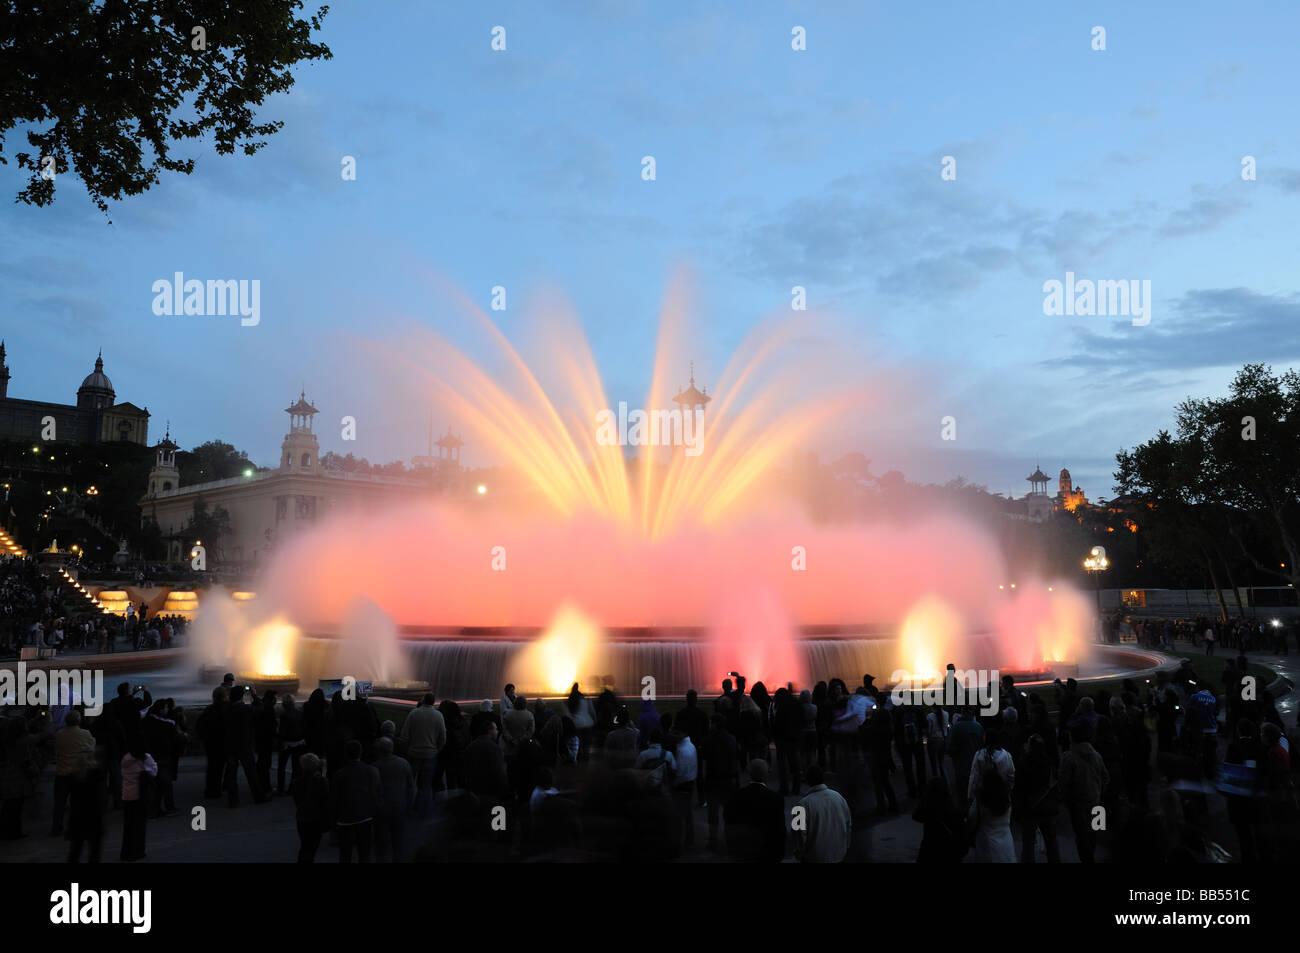 Font Magica - Magic Fountain in Barcelona Spain - Stock Image